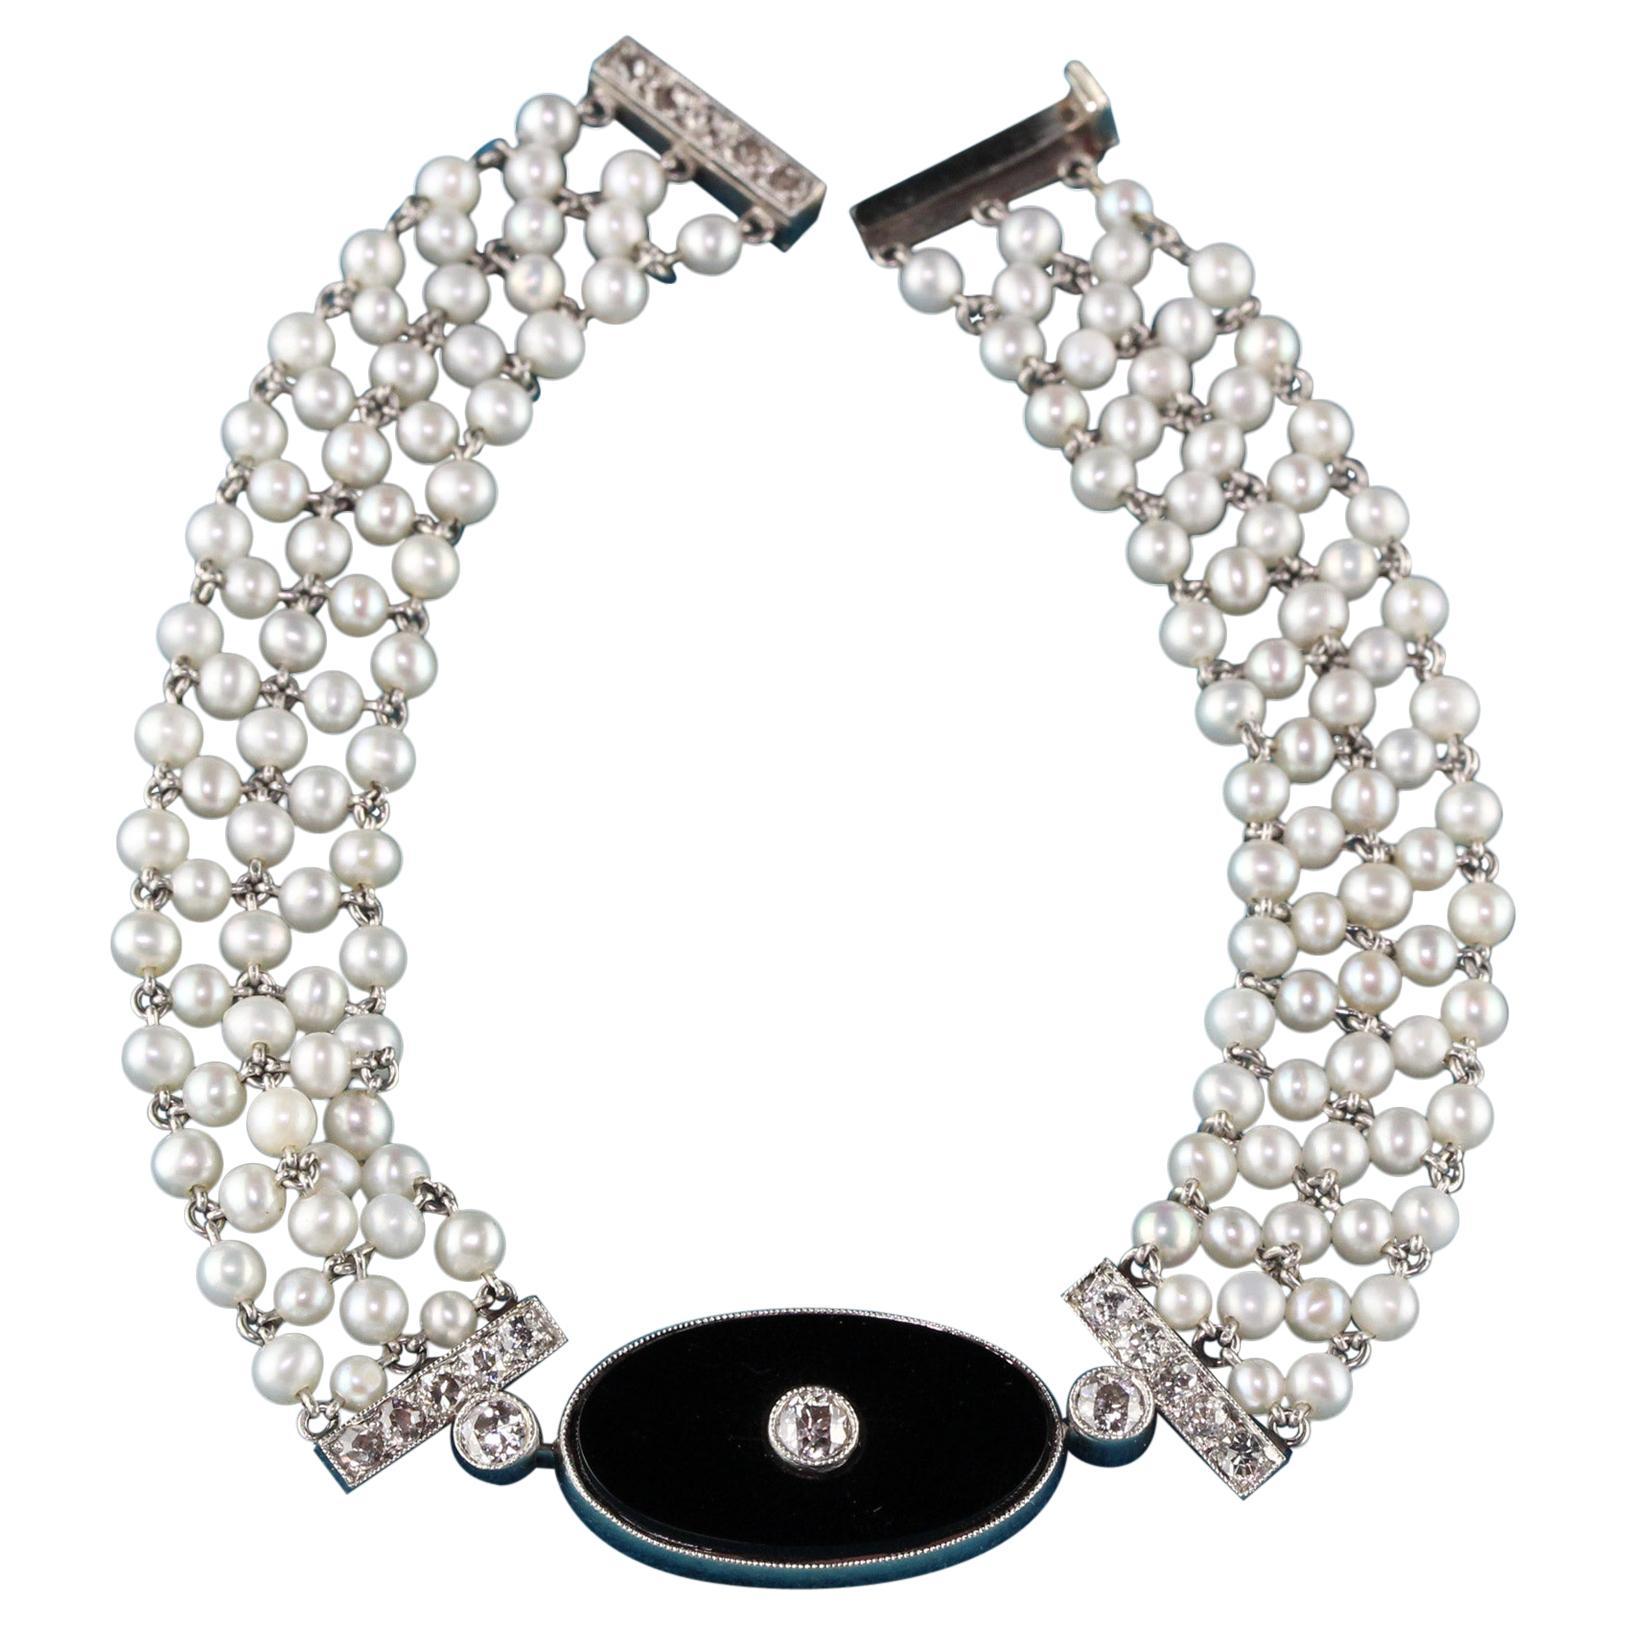 Antique Art Deco Platinum Old Euro Cut Diamond, Onyx, and Pearl Bracelet